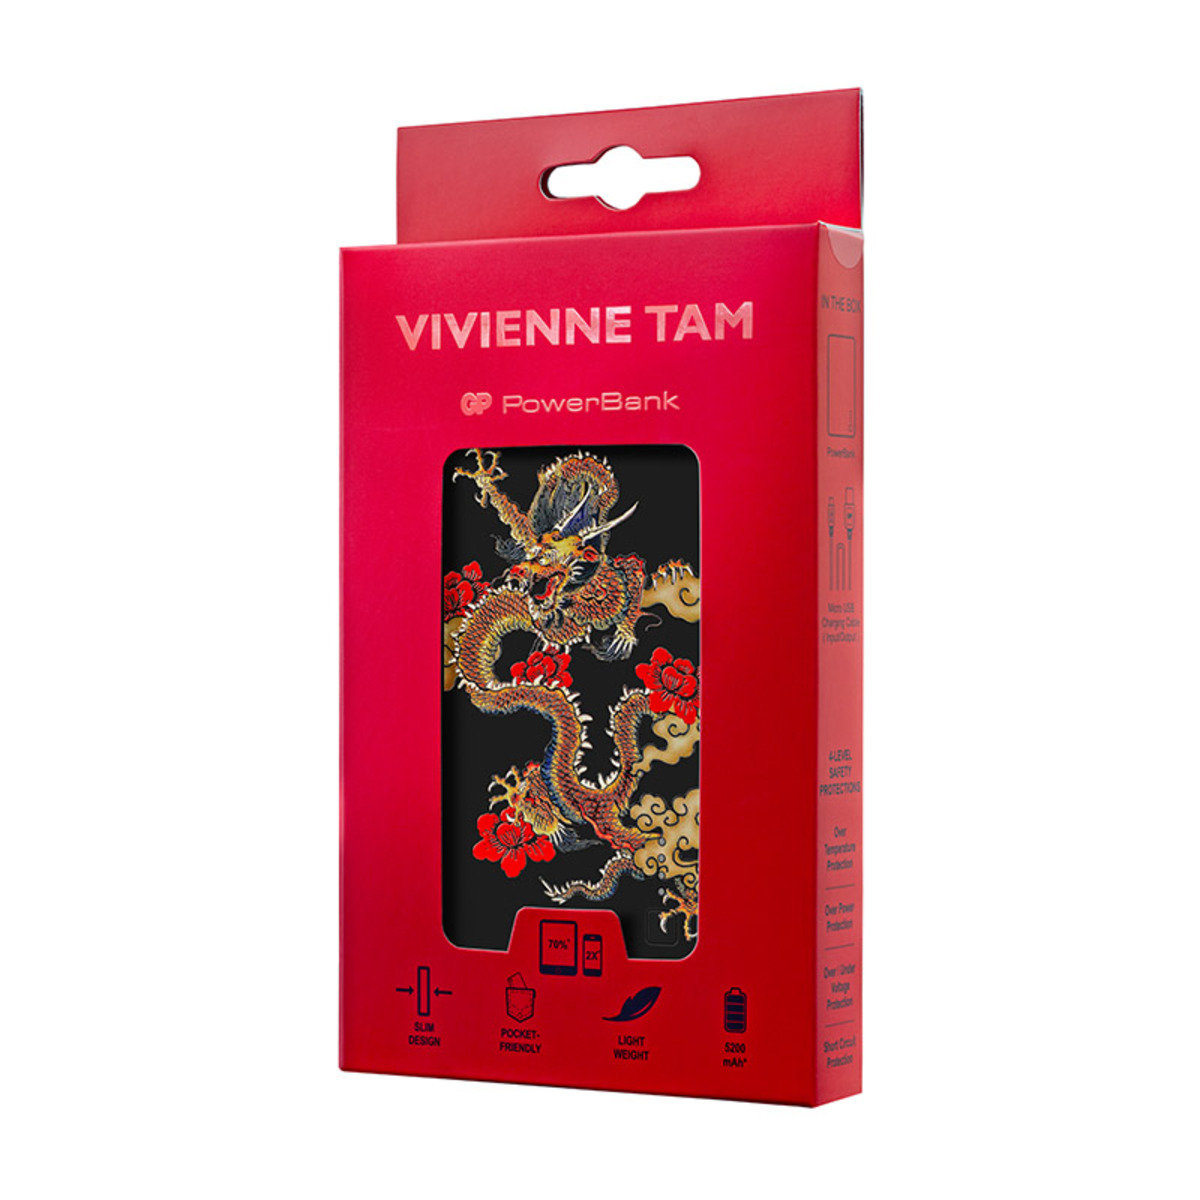 Vivienne Tam x GP 限量版儲電寶 PowerBank 352PB 5200mAh - 舞騰龍